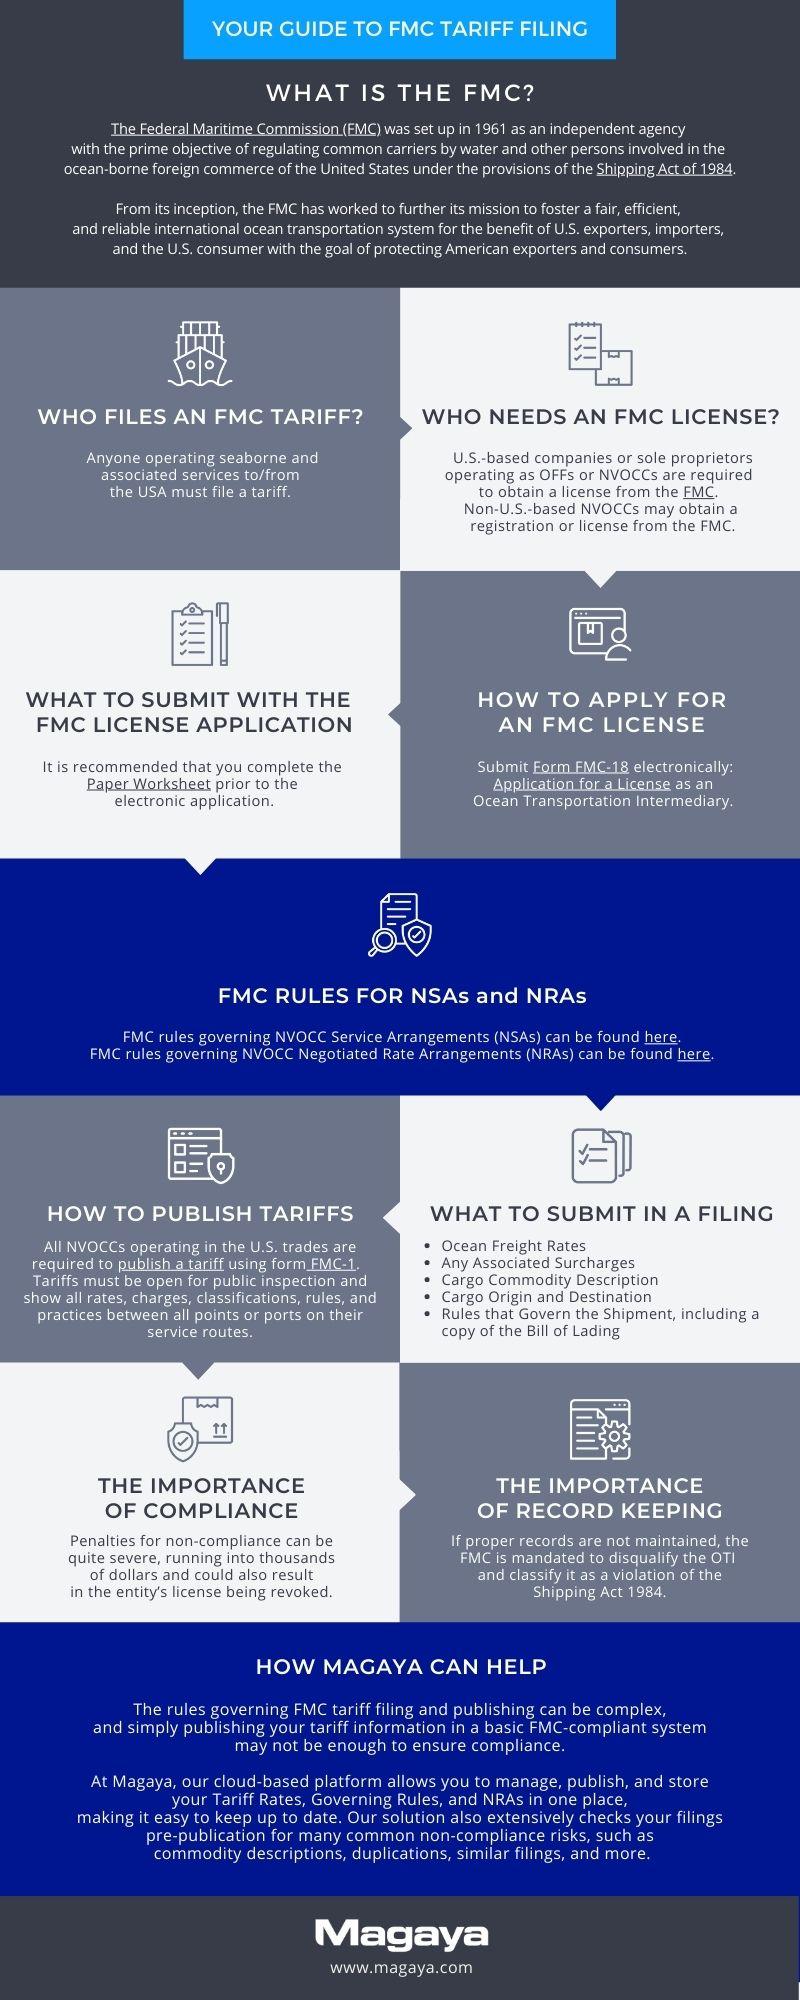 Magaya Guide to FMC Tariff Filings Infographic